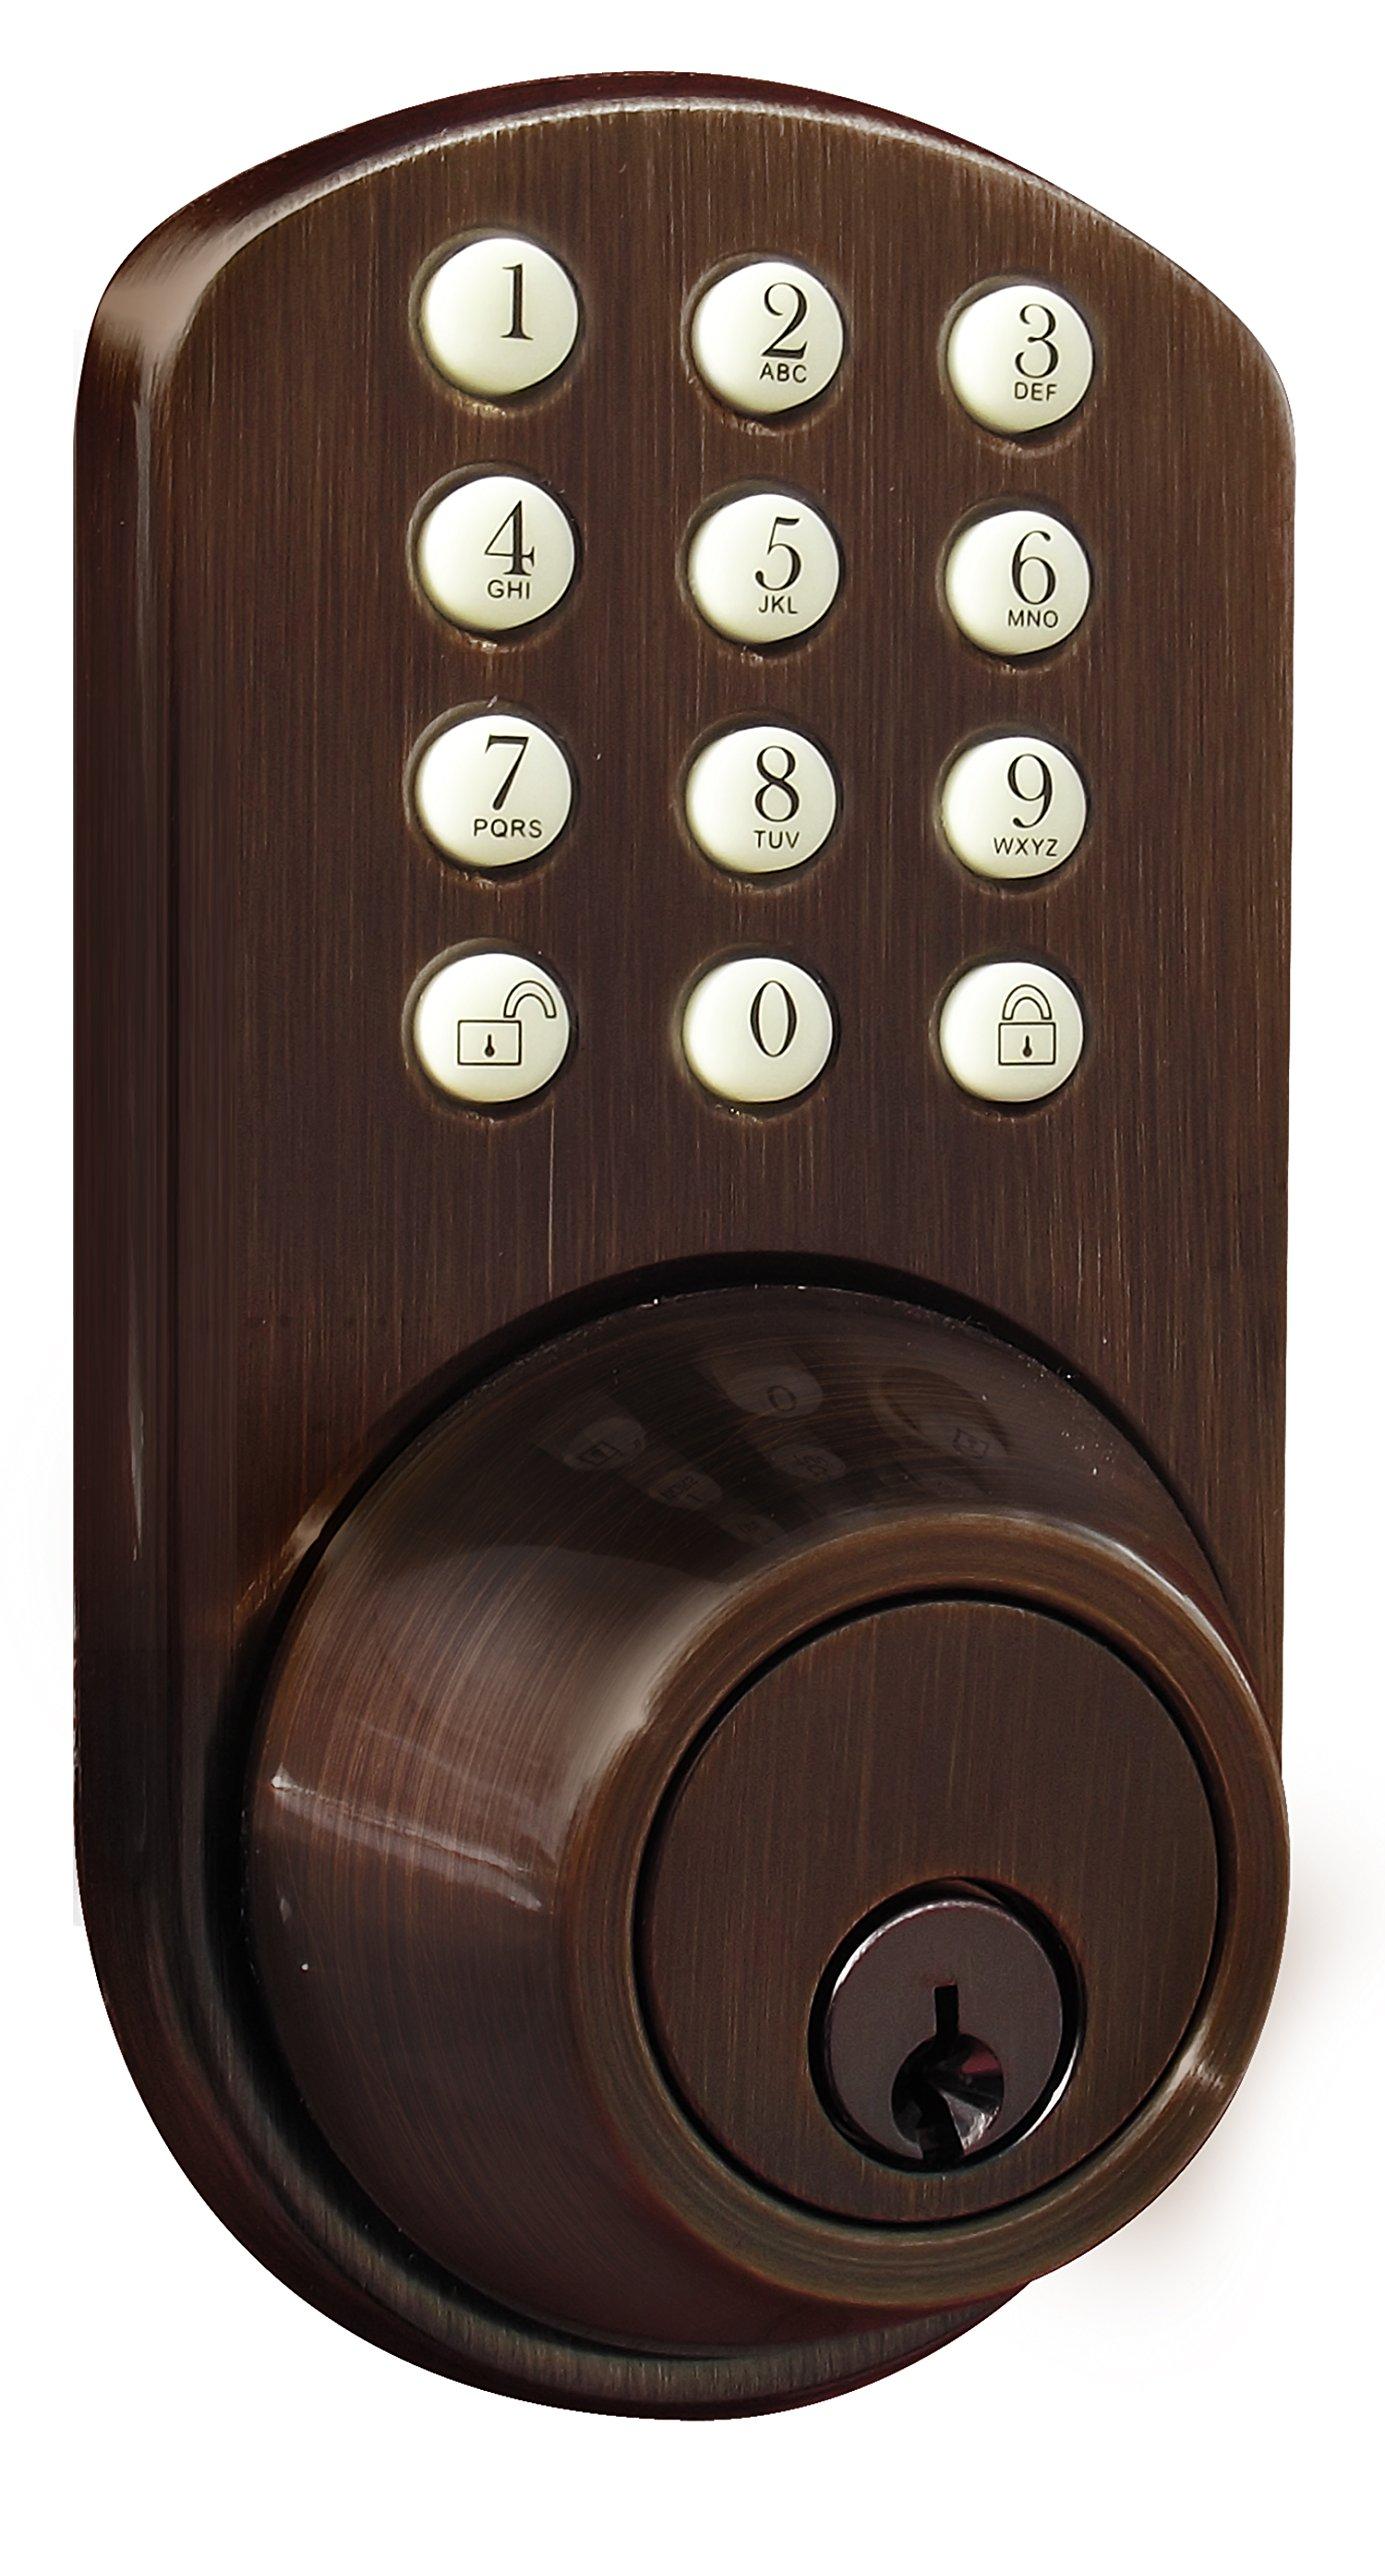 MiLocks TF-02OB Digital Deadbolt Door Lock with Electronic Keypad for Exterior Doors, Oil Rubbed Bronze